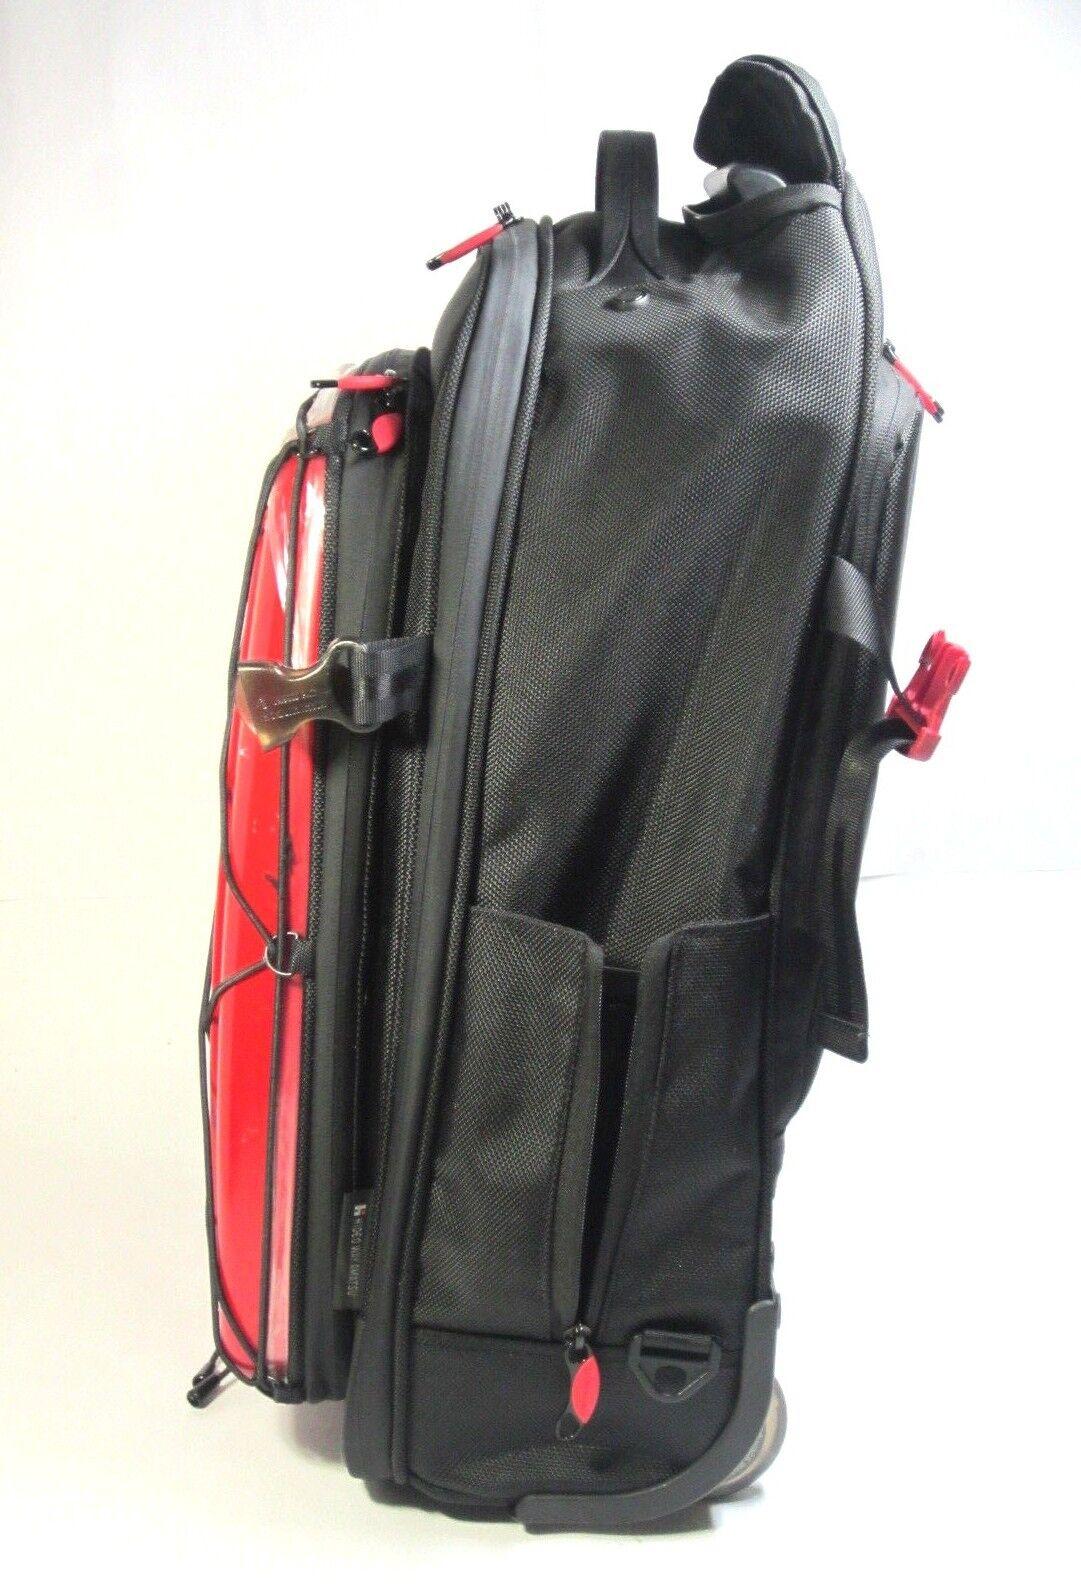 Hideo Wakamatsu Hybrid Gear Trolley3 3way Carry Bag Suitcase Black 28l For Sale Online Ebay